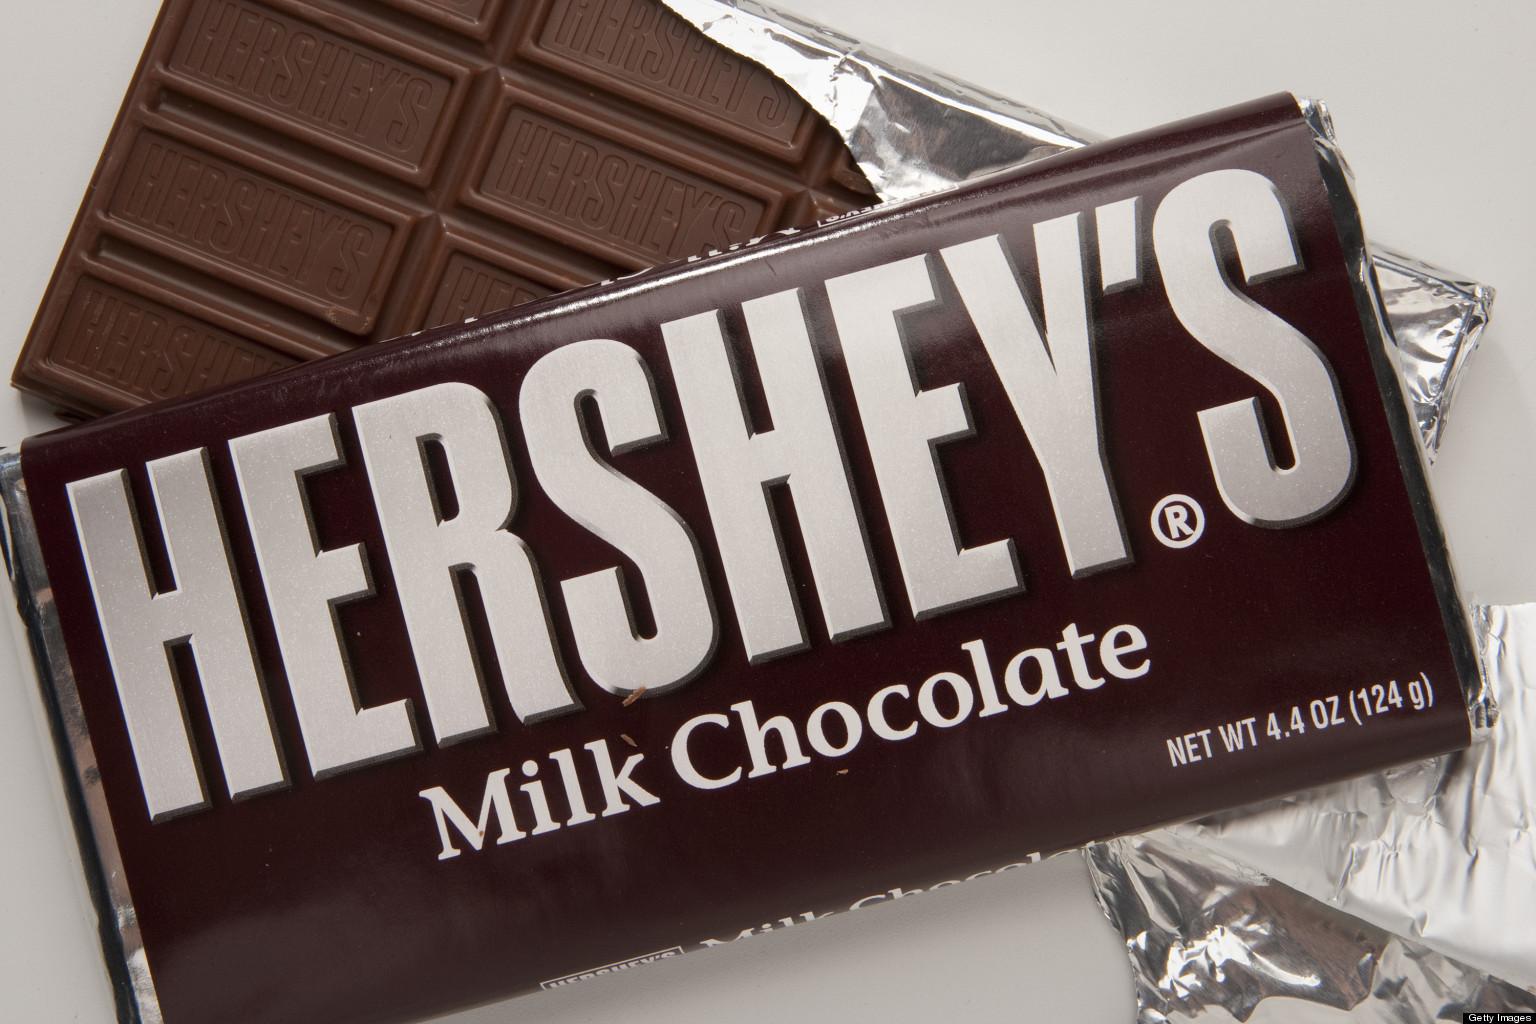 Hershey S Chocolate 3d Printer Announced